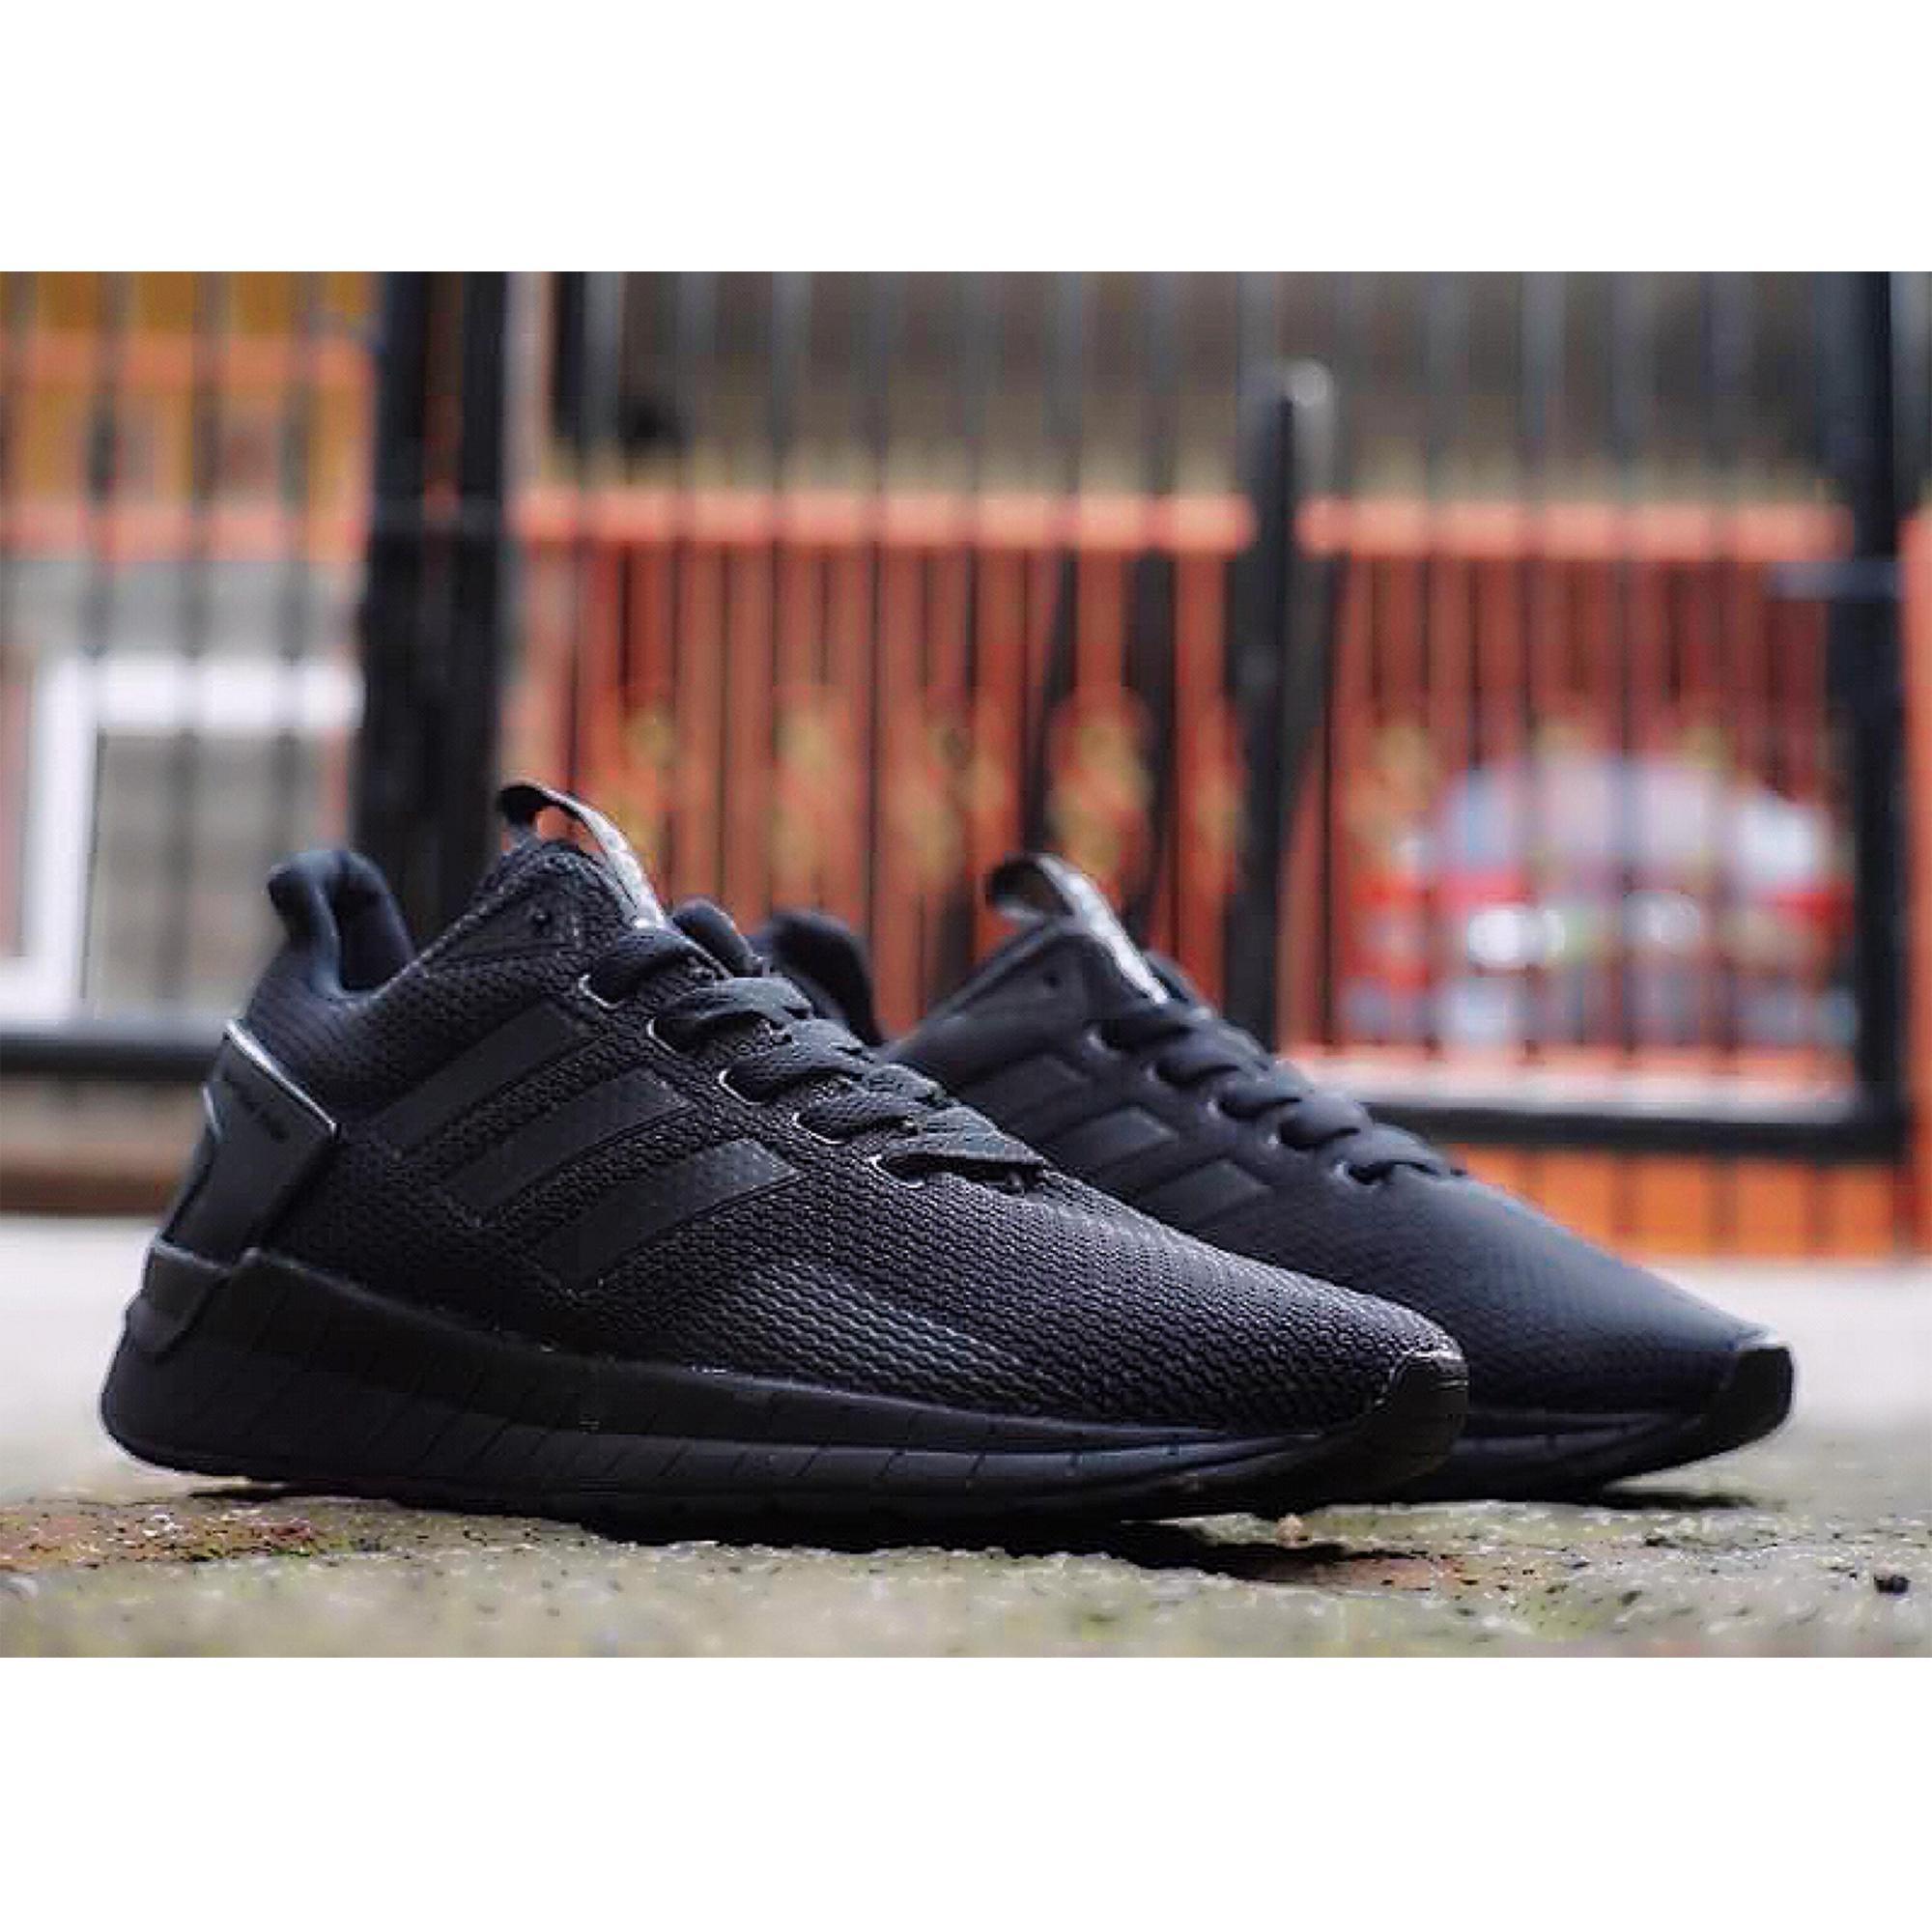 Fitur Sepatu Keren Original Adidas Questar Ride Black White Keren